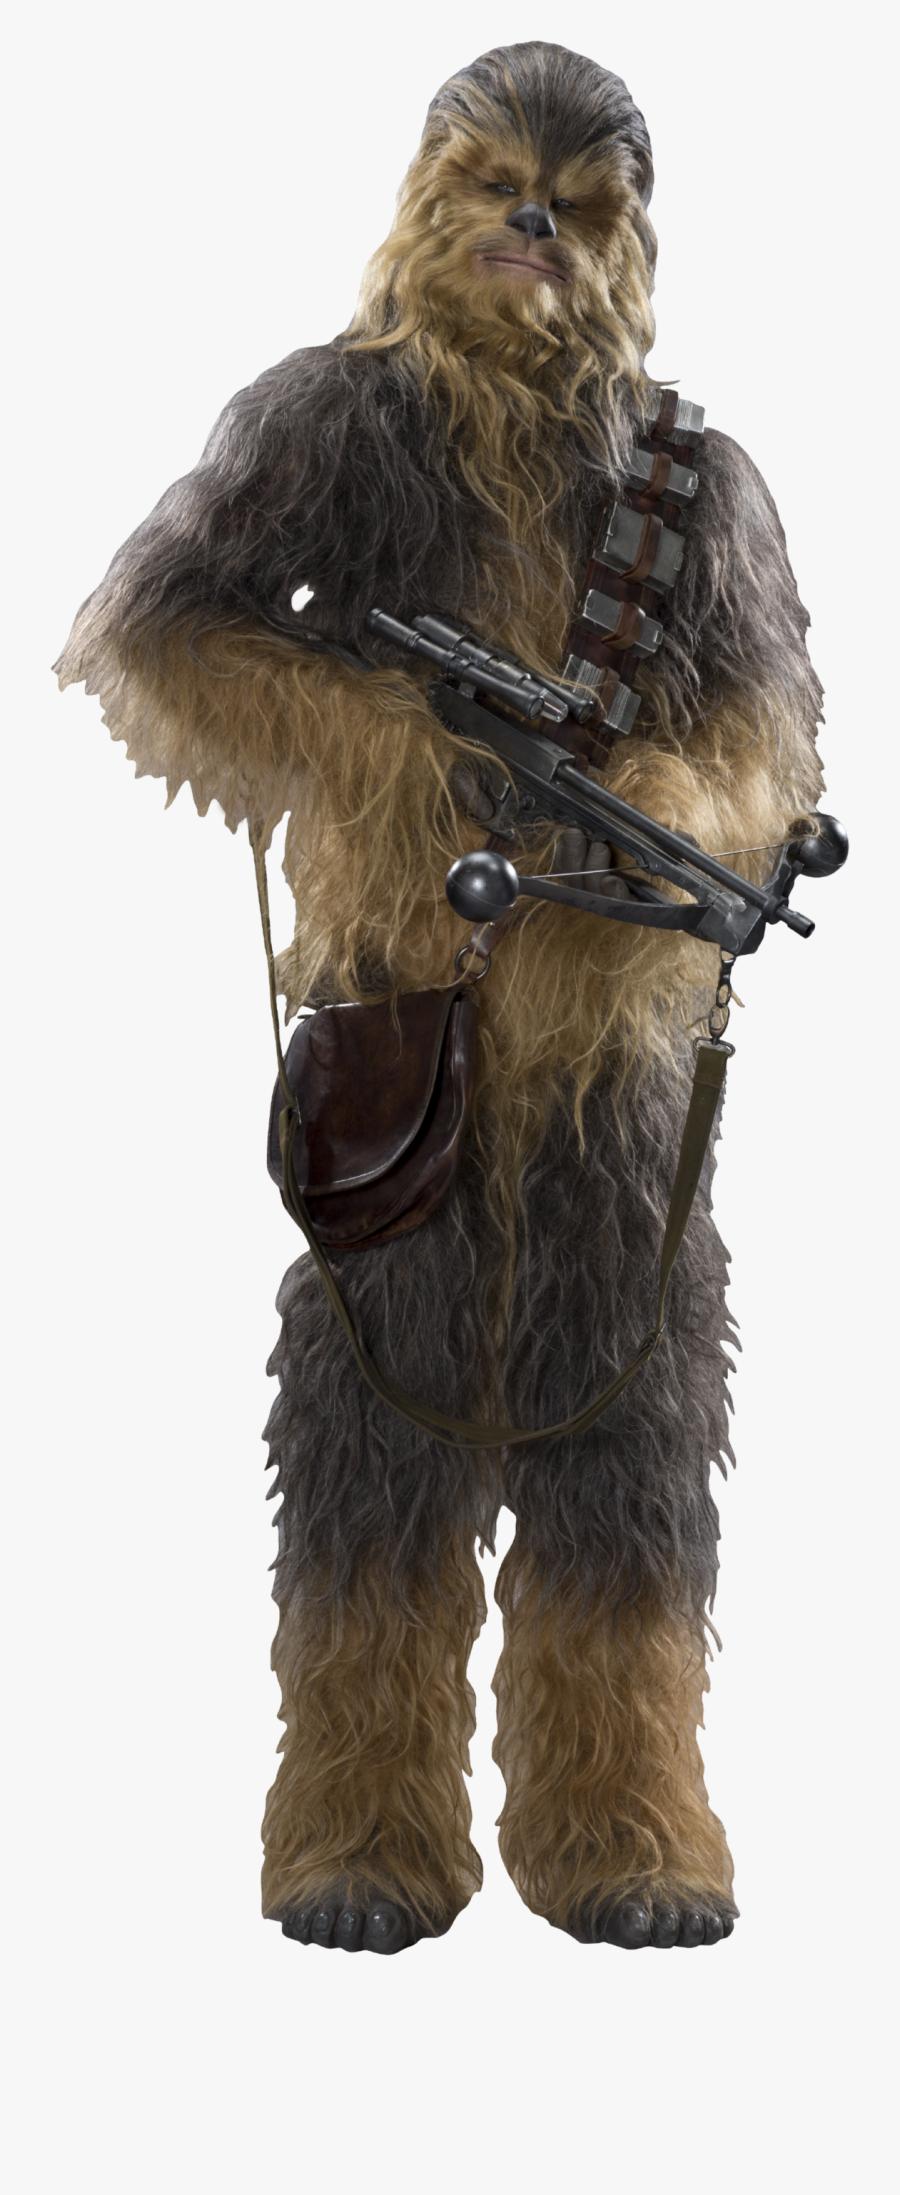 Star Wars Chewbacca Transparent Background, Transparent Clipart